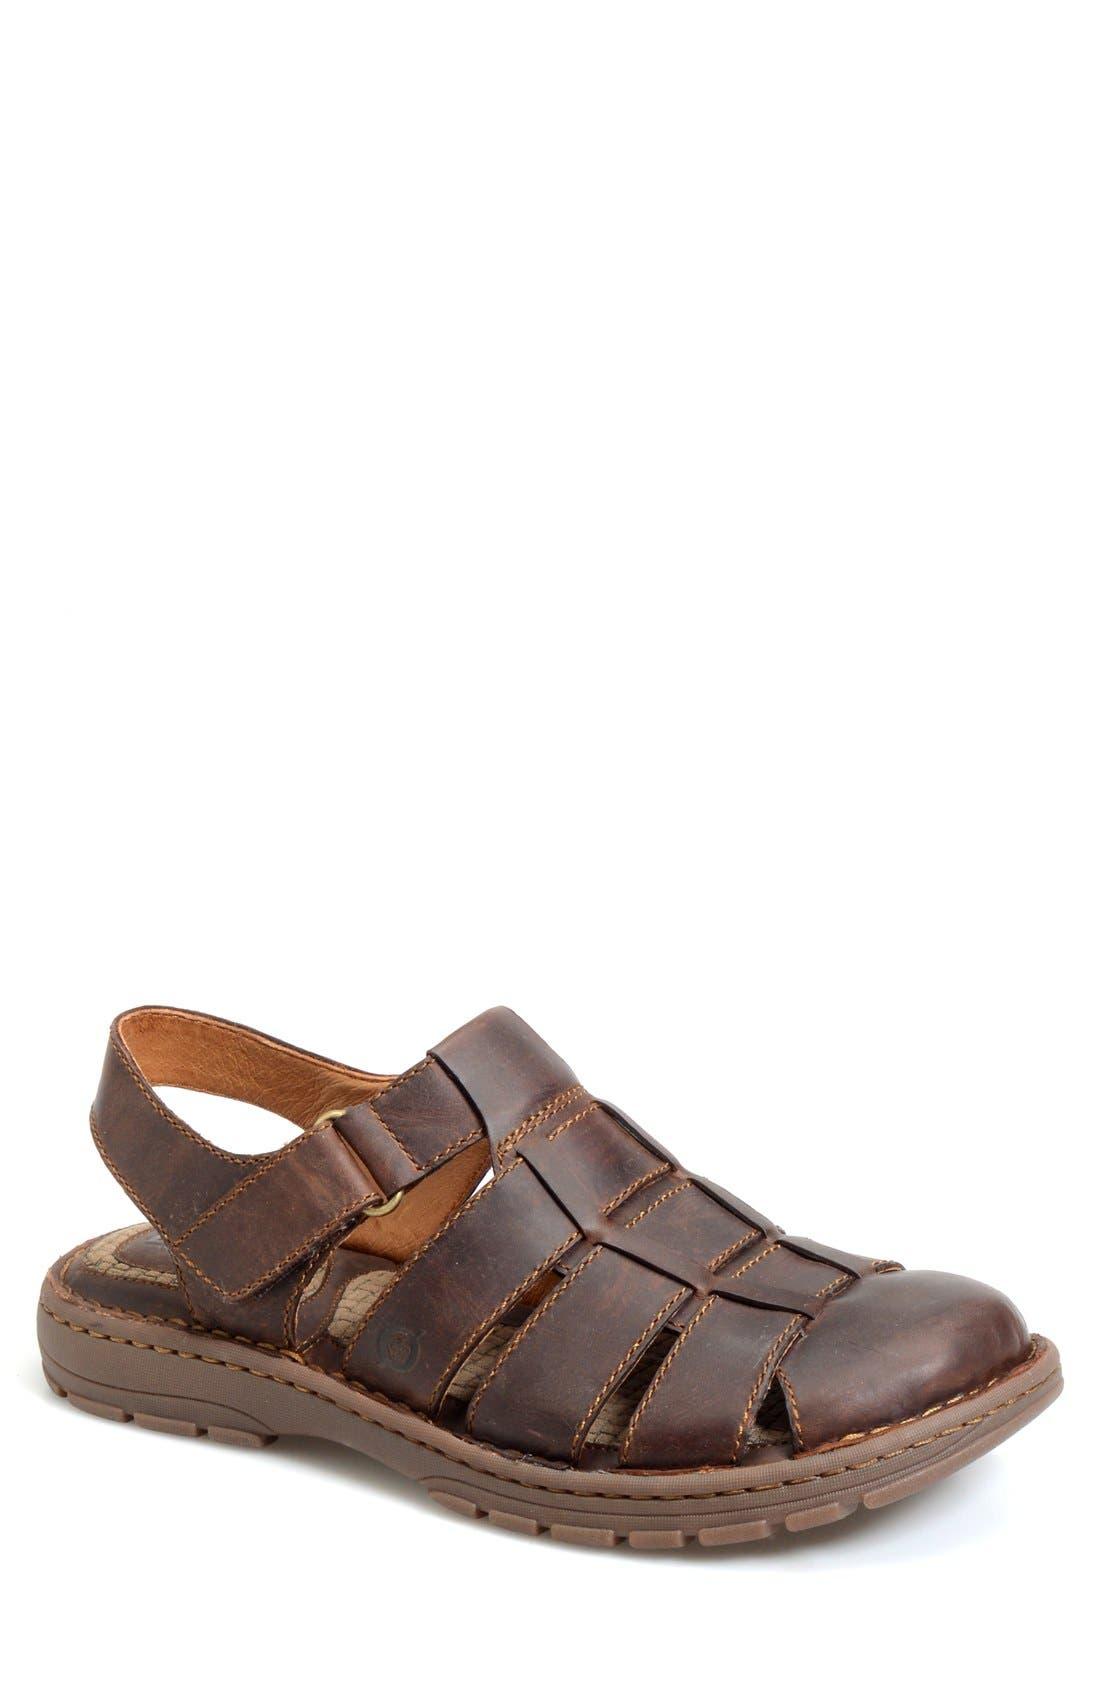 'Osmond' Leather Sandal,                             Main thumbnail 1, color,                             Mink